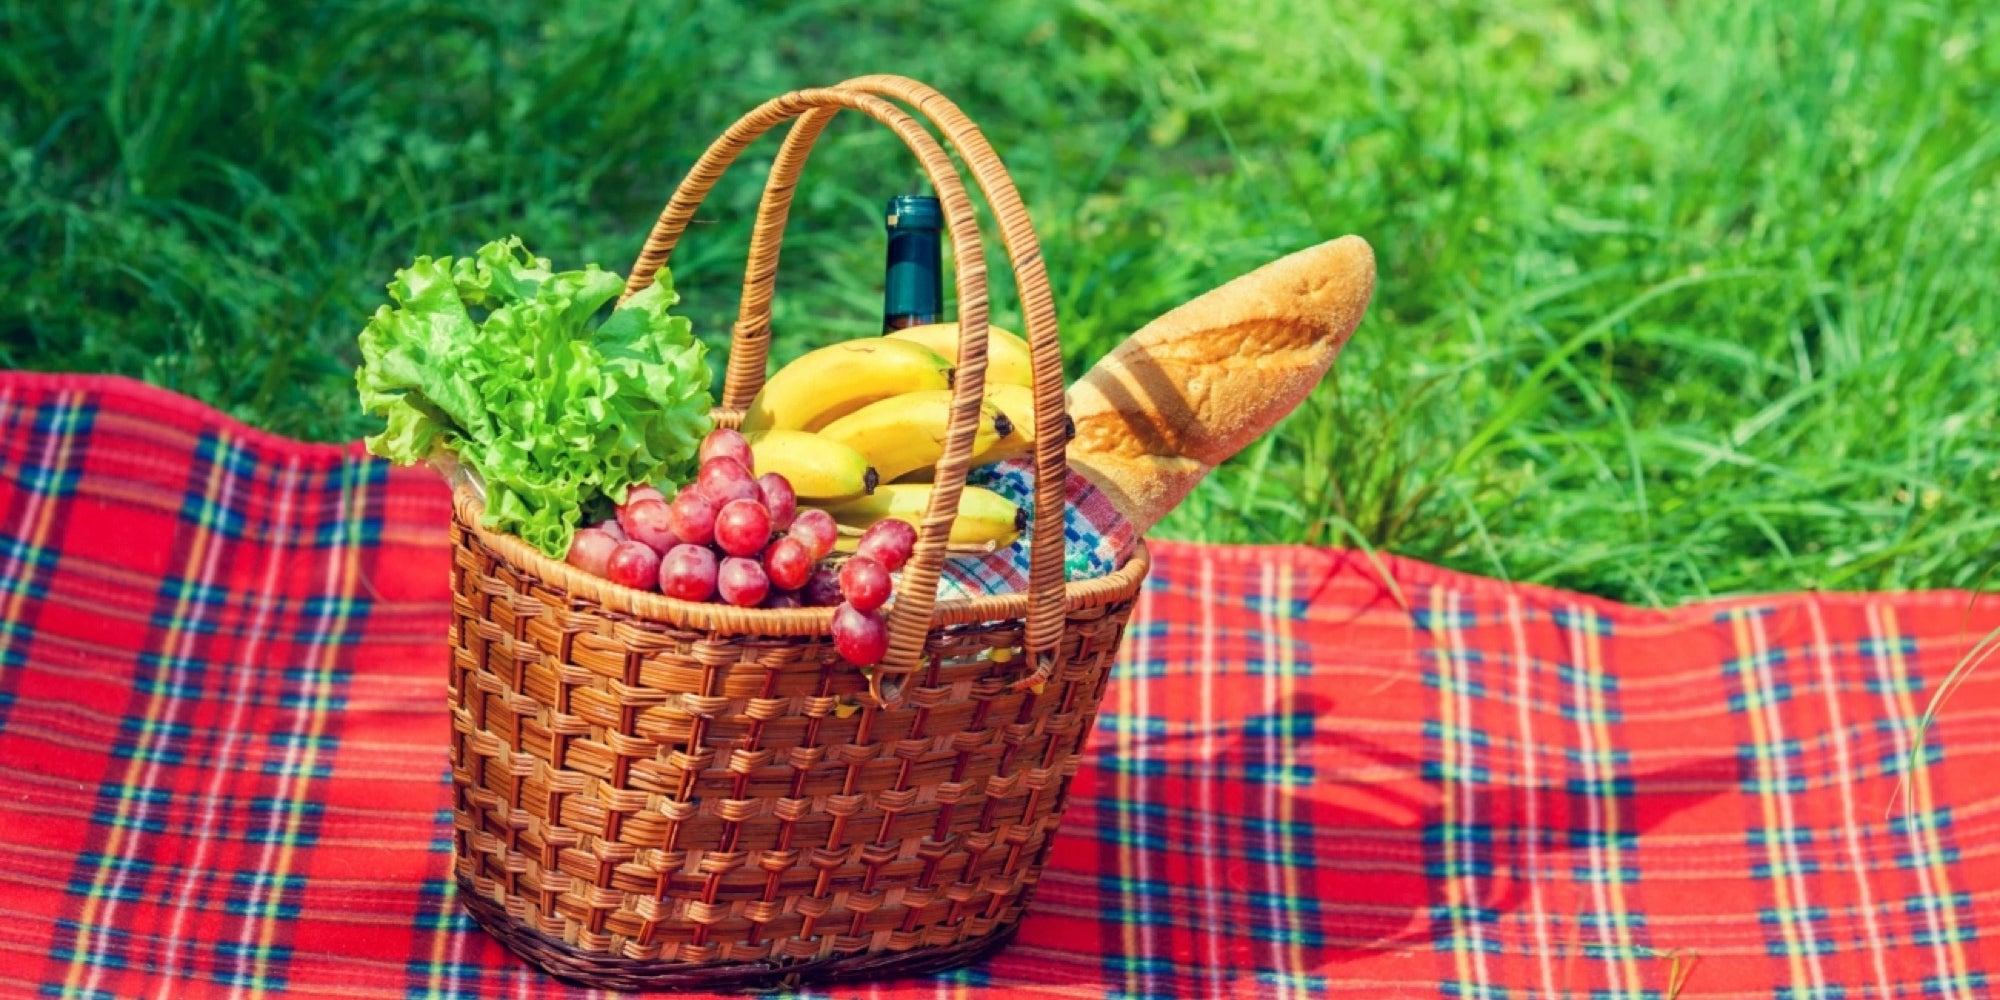 Gift Basket-Making Business